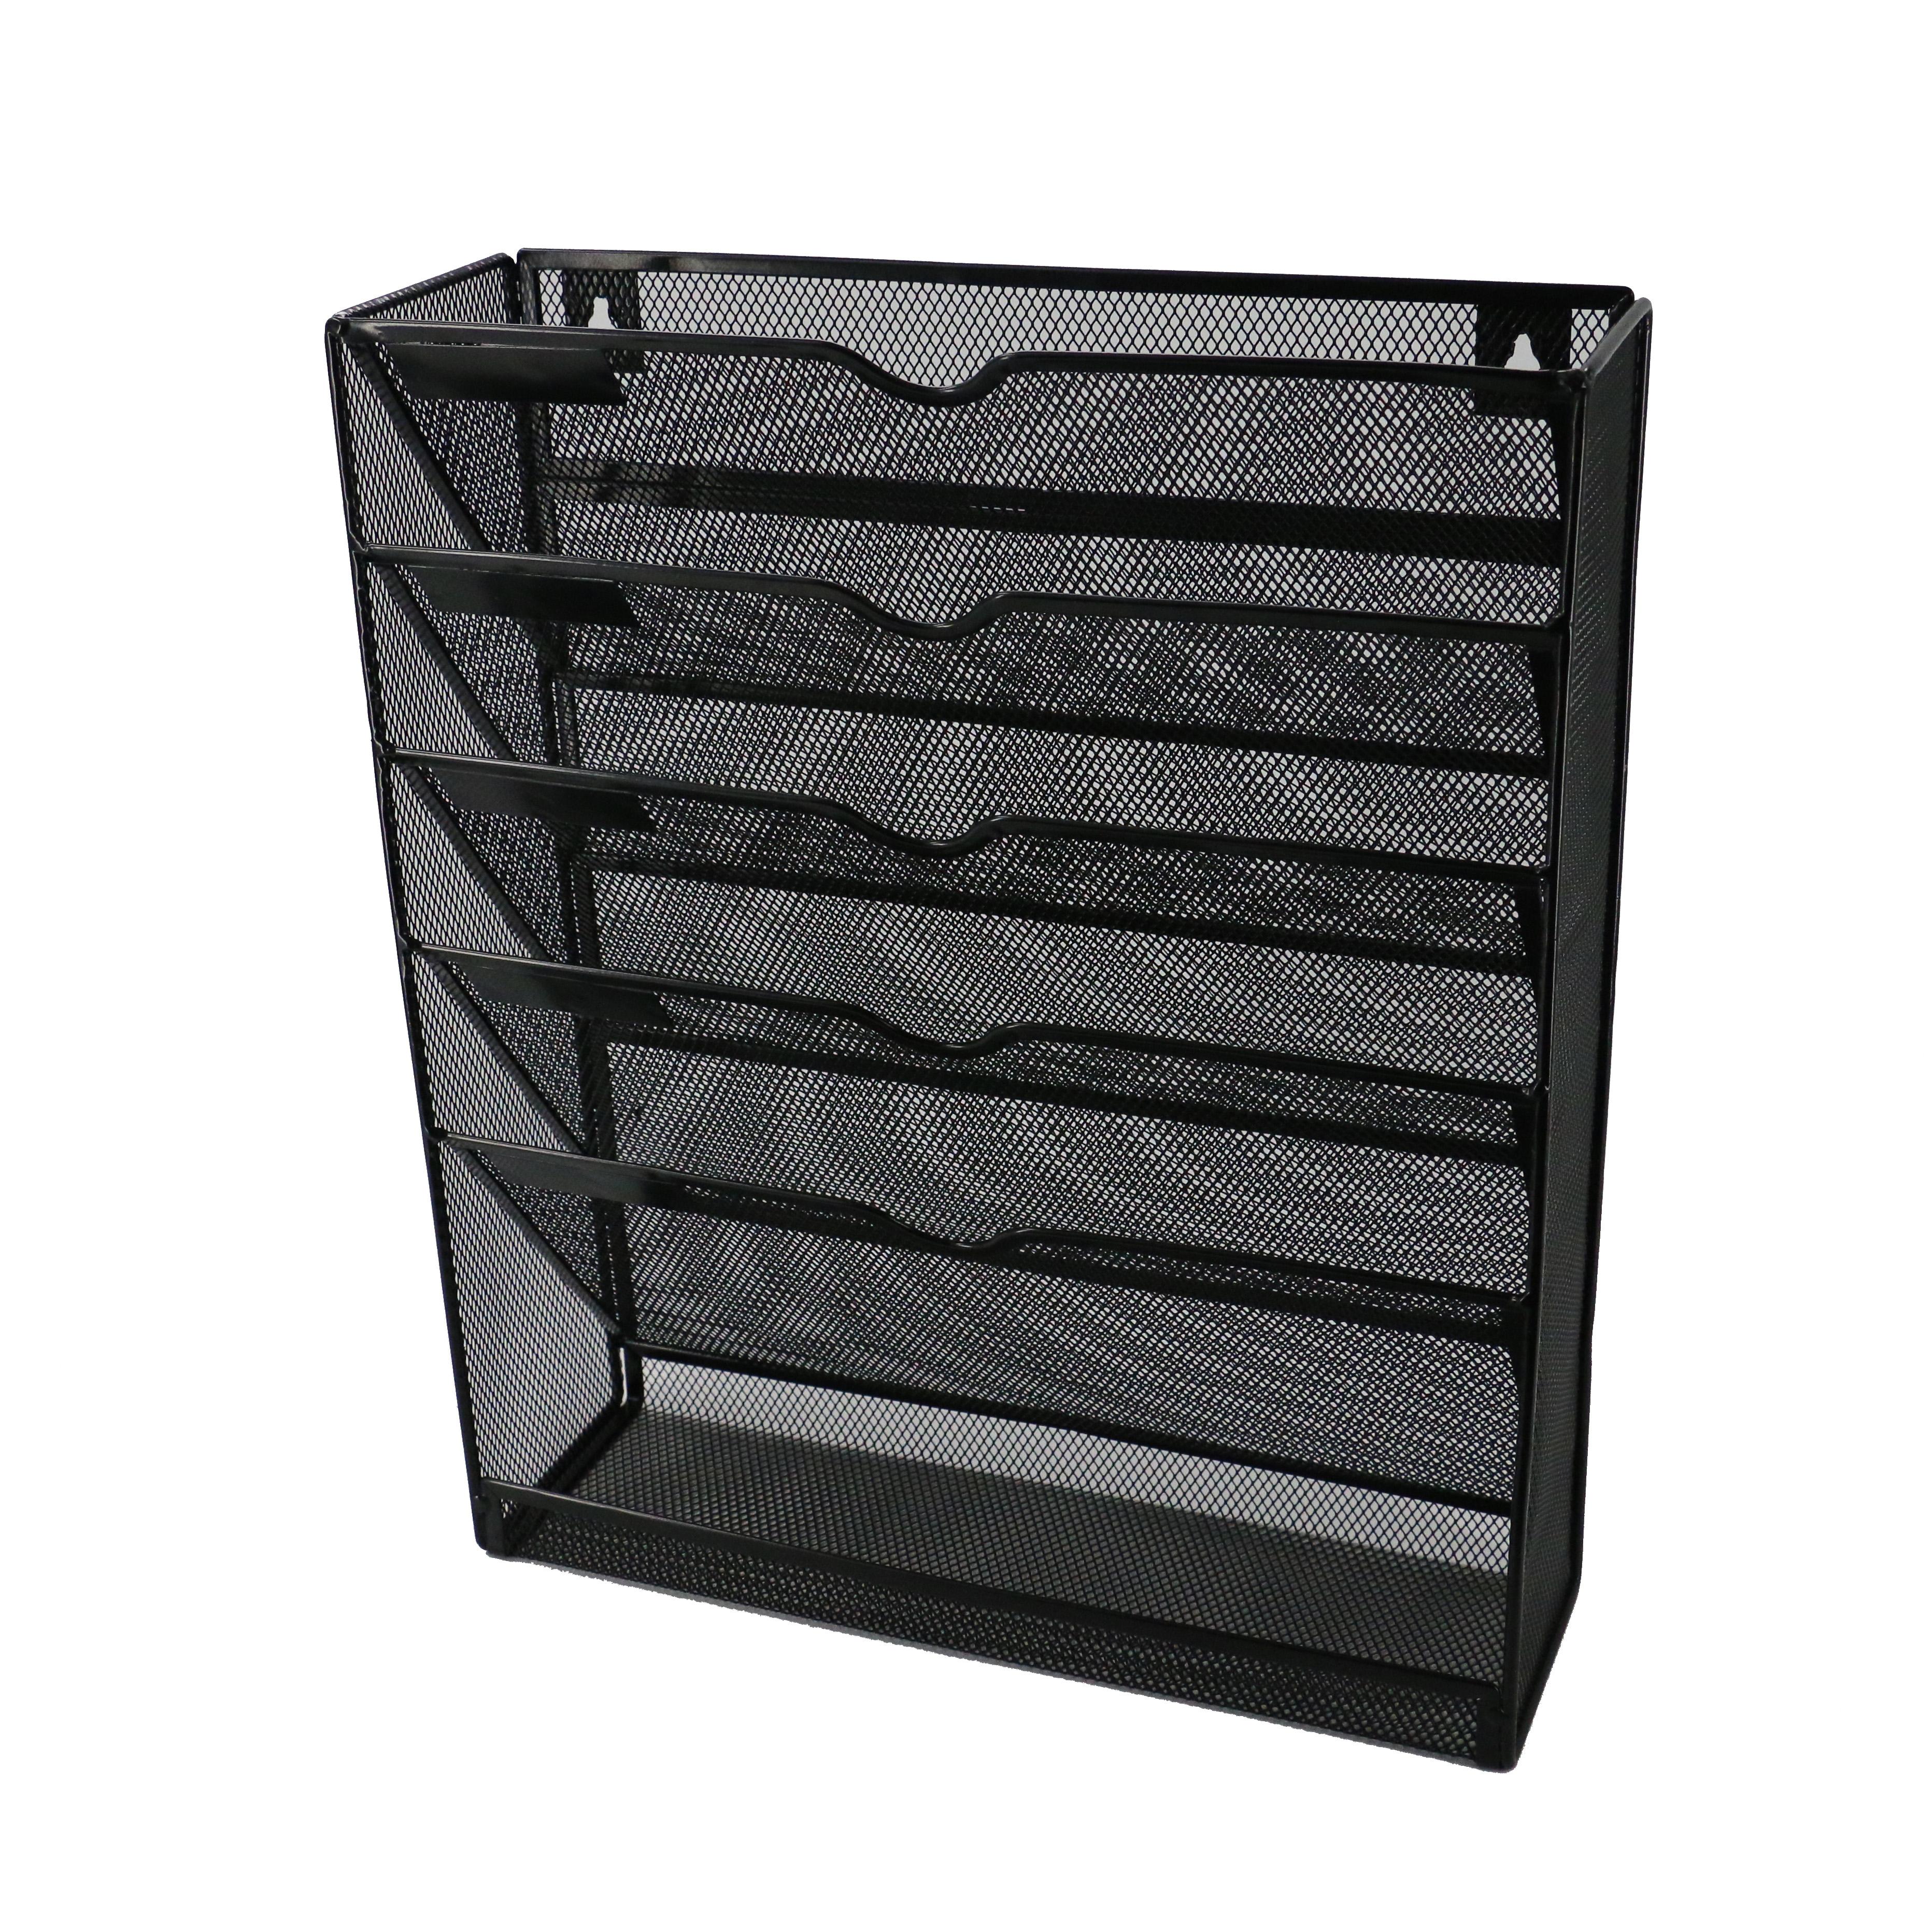 Office Metal Mesh Wall File Mesh Organizer Black 5 Pockets